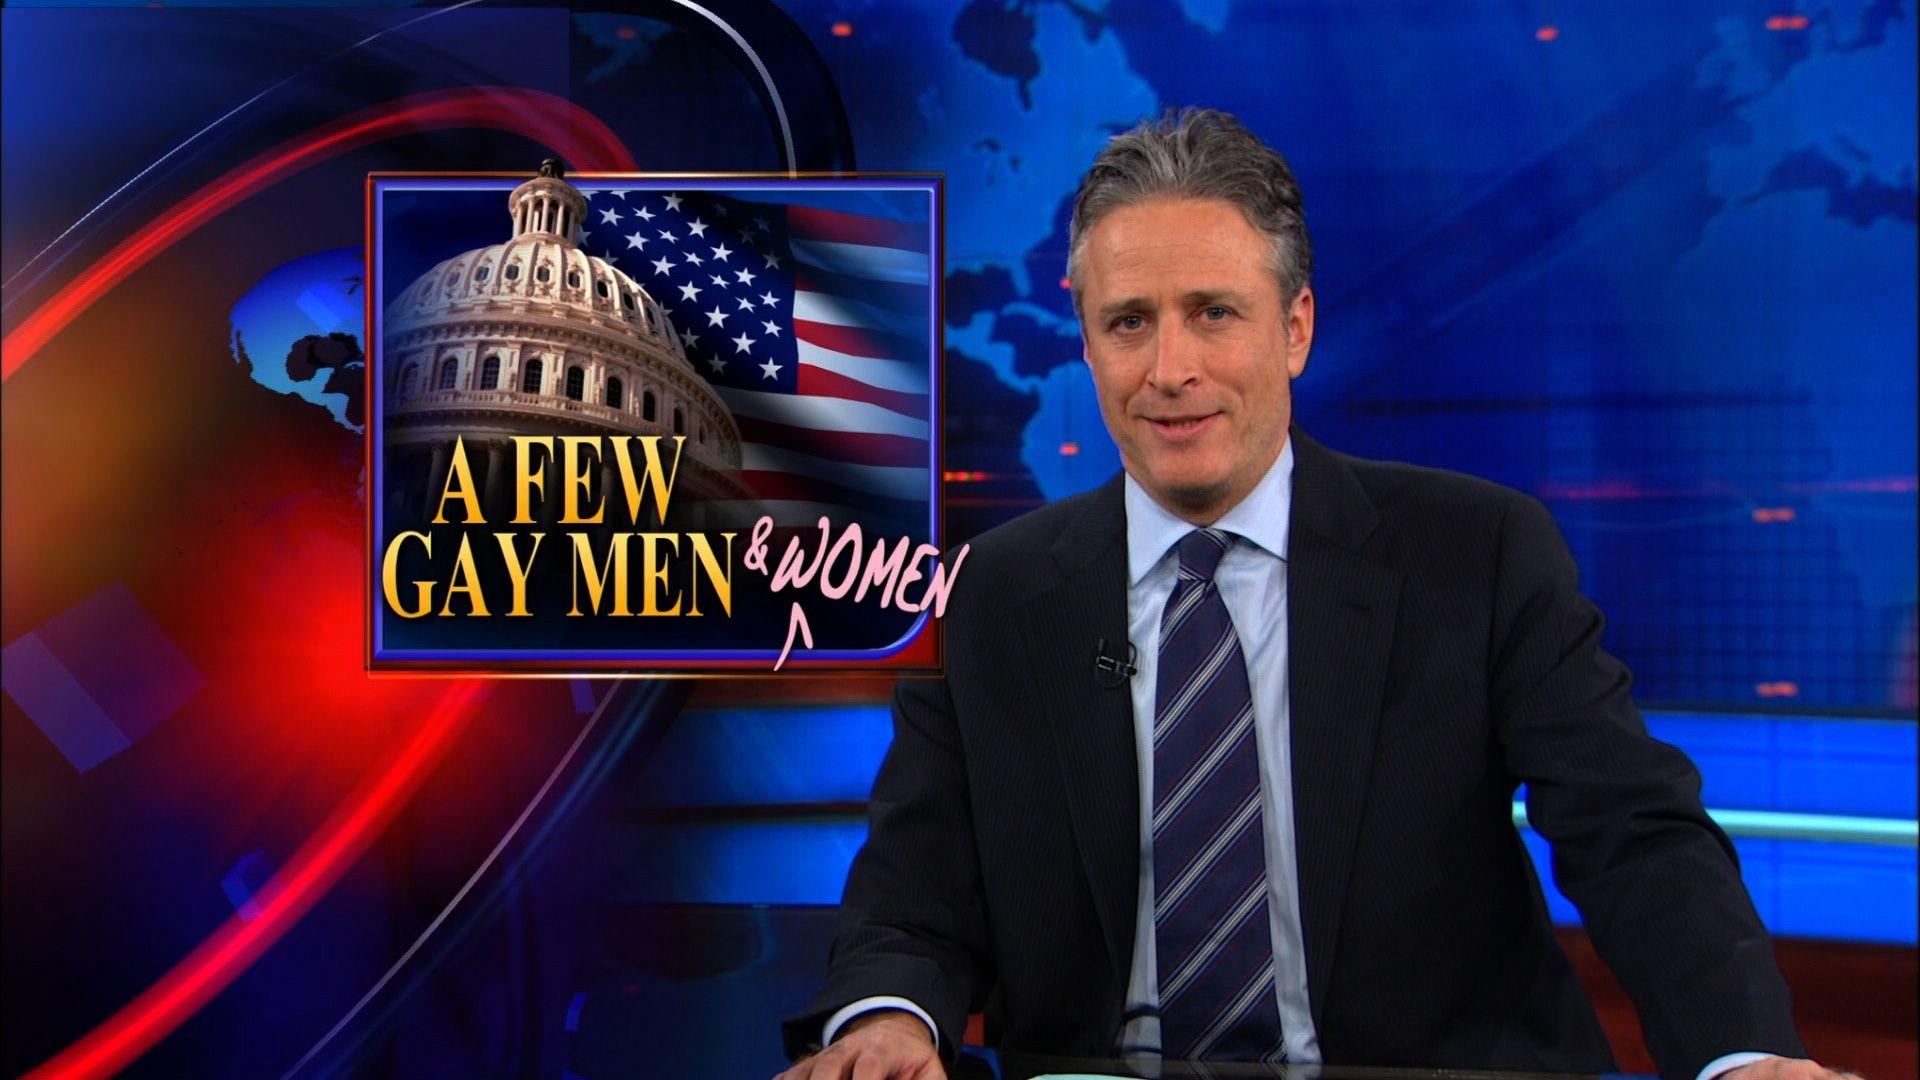 A Few Gay Men  Women  The Daily Show with Jon Stewart